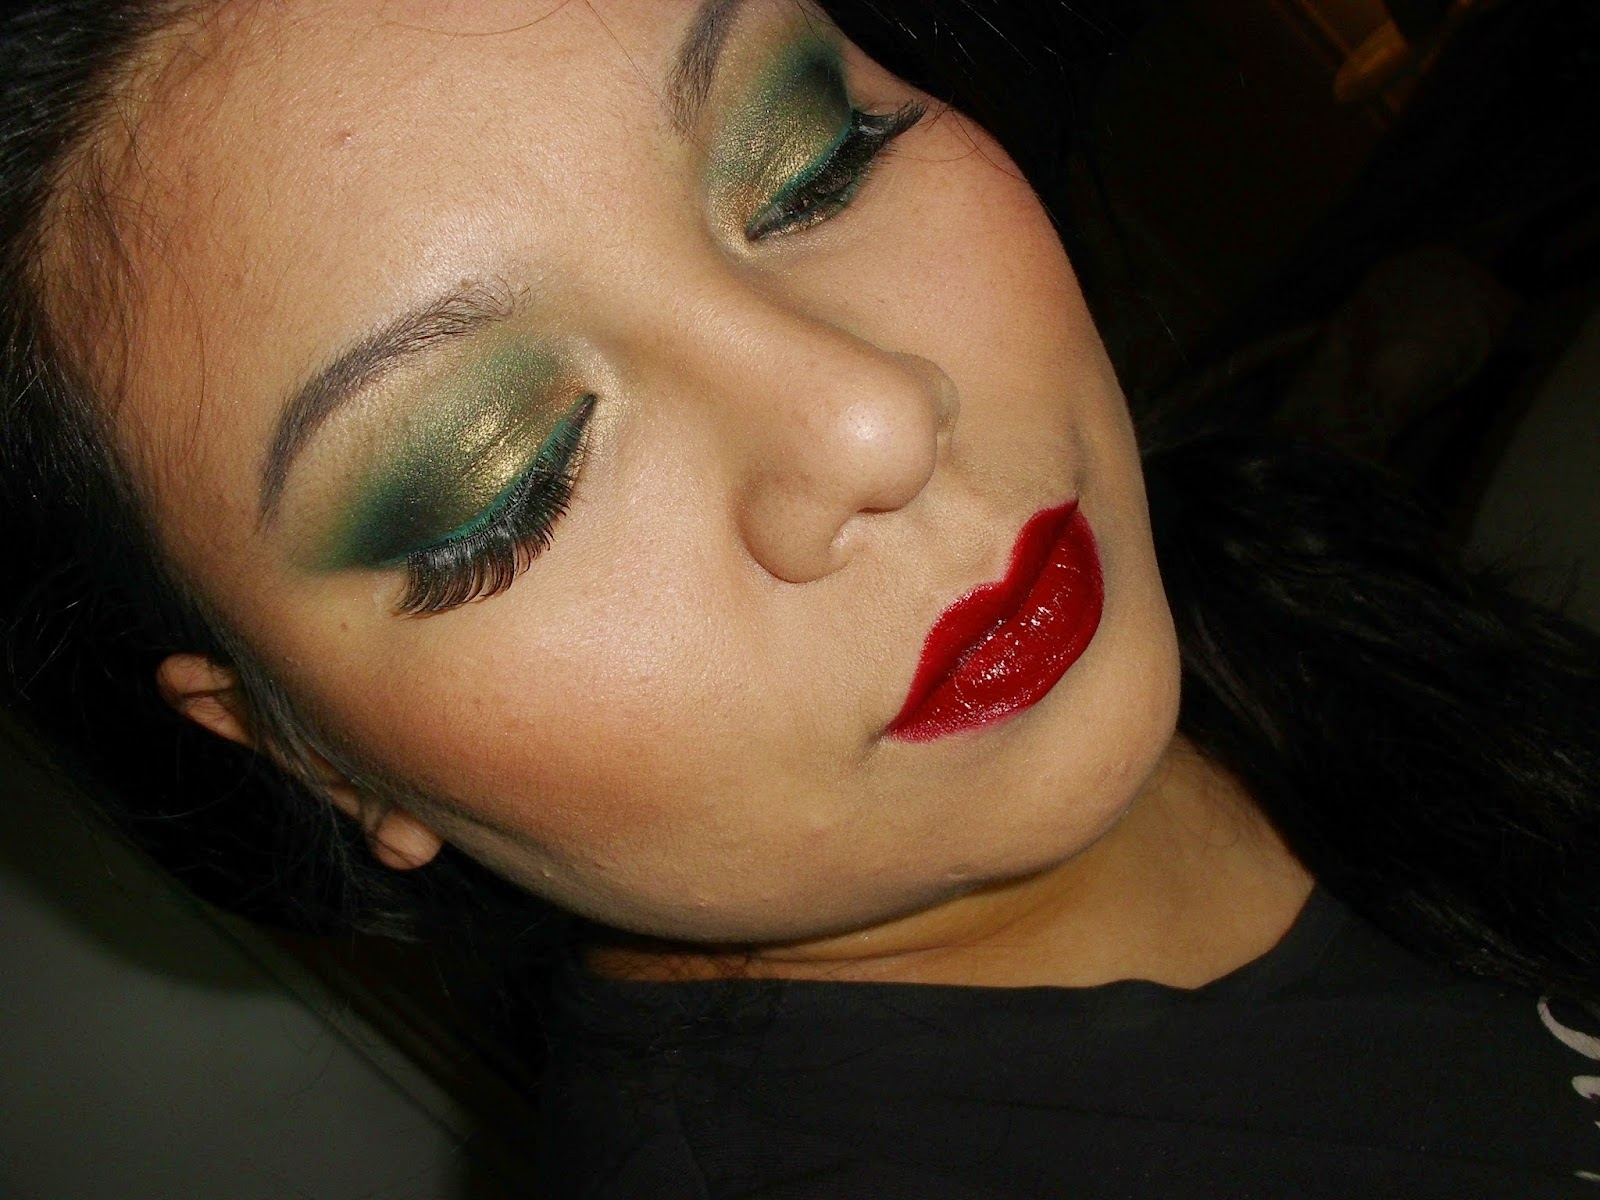 Cherry Diamond Lips, Paciugopedia, Viola Killer Colours, Nabla, Sleek, Garden of Eden, Farulein 38, Eyebrow Shaping, Dolce&Gabbama, Hey Boss!, 120 Intense Passion Duo Lipstick